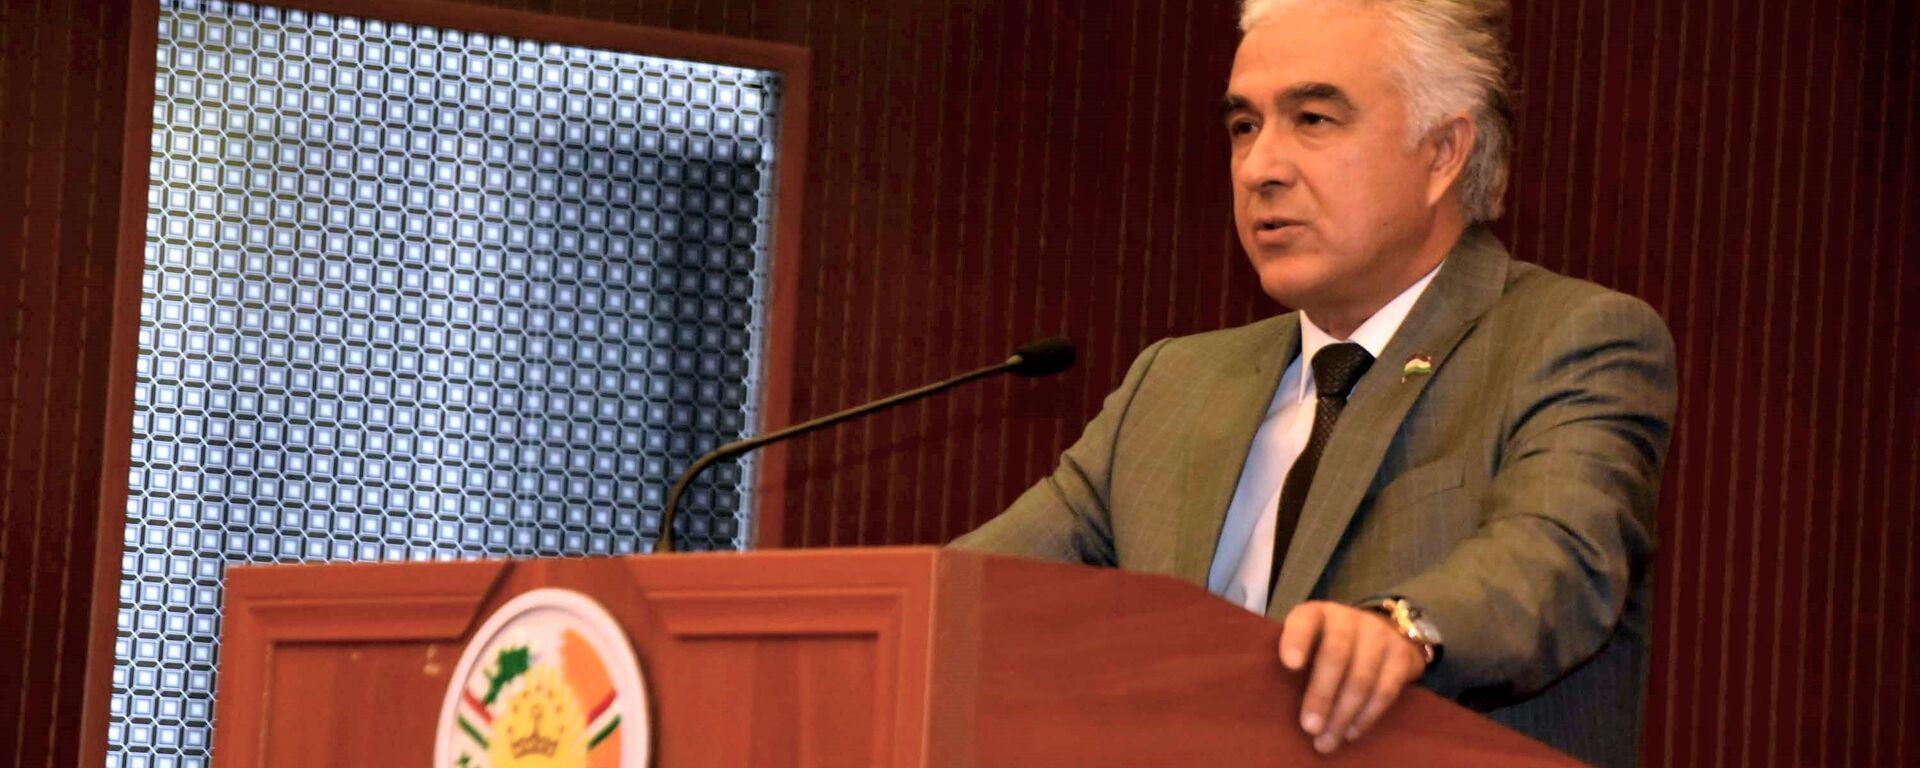 Председатель Демократической партии  Саидджафар Усмонзода - Sputnik Таджикистан, 1920, 20.08.2021